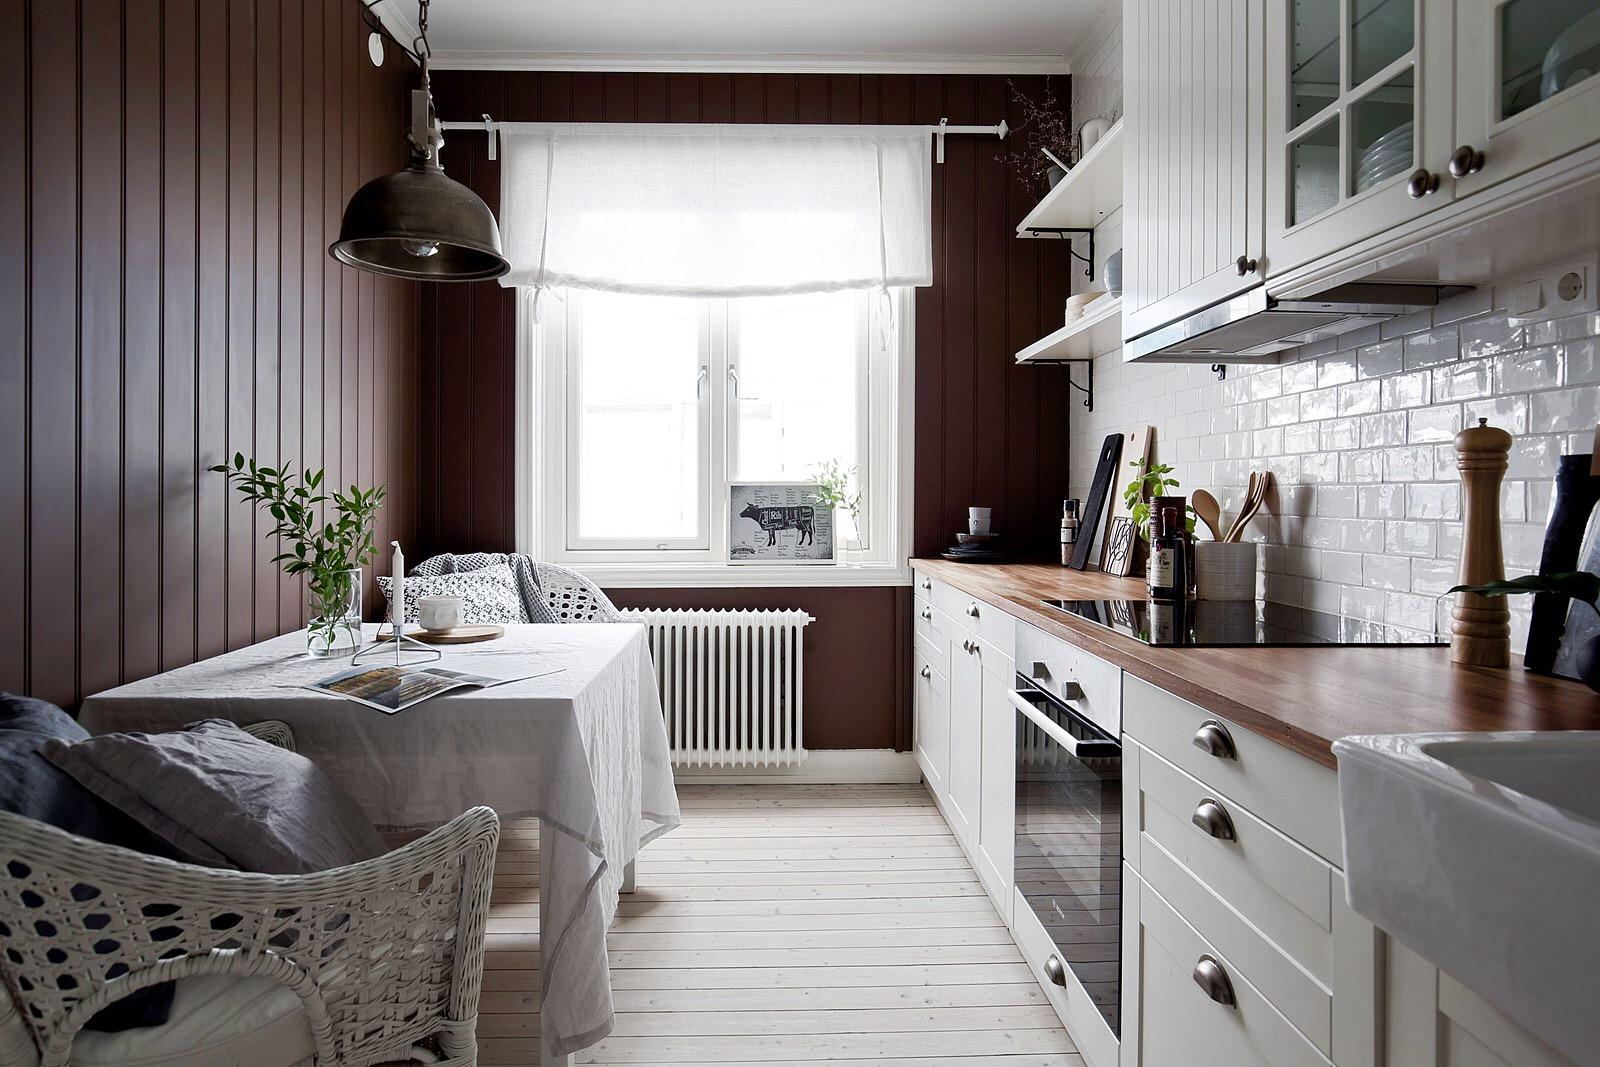 кухня окно стол лампа